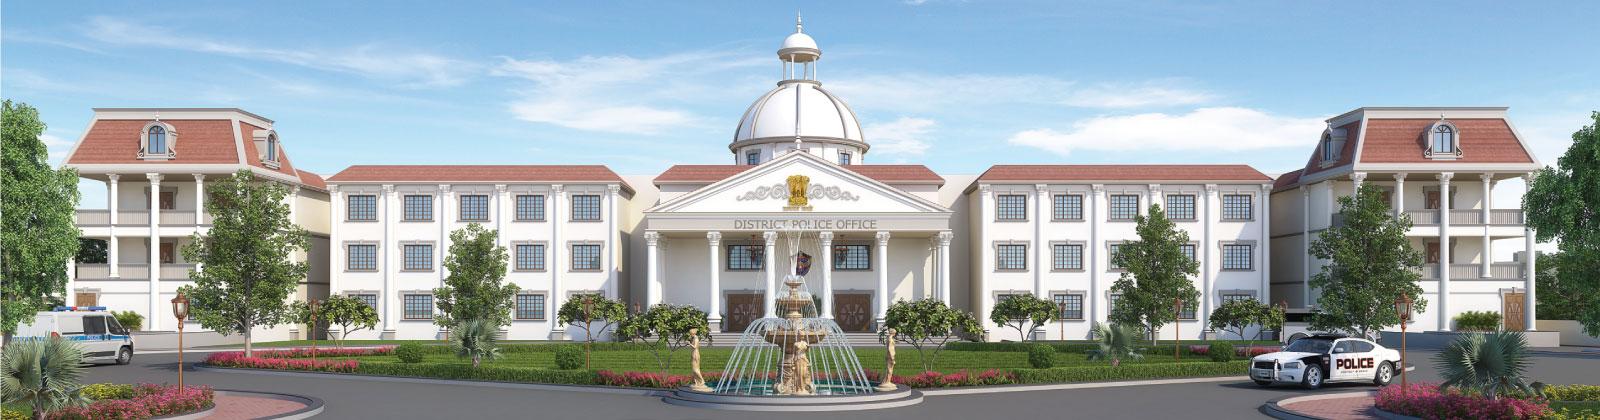 Telangana State Police Housing Corporation Ltd - Actual Image